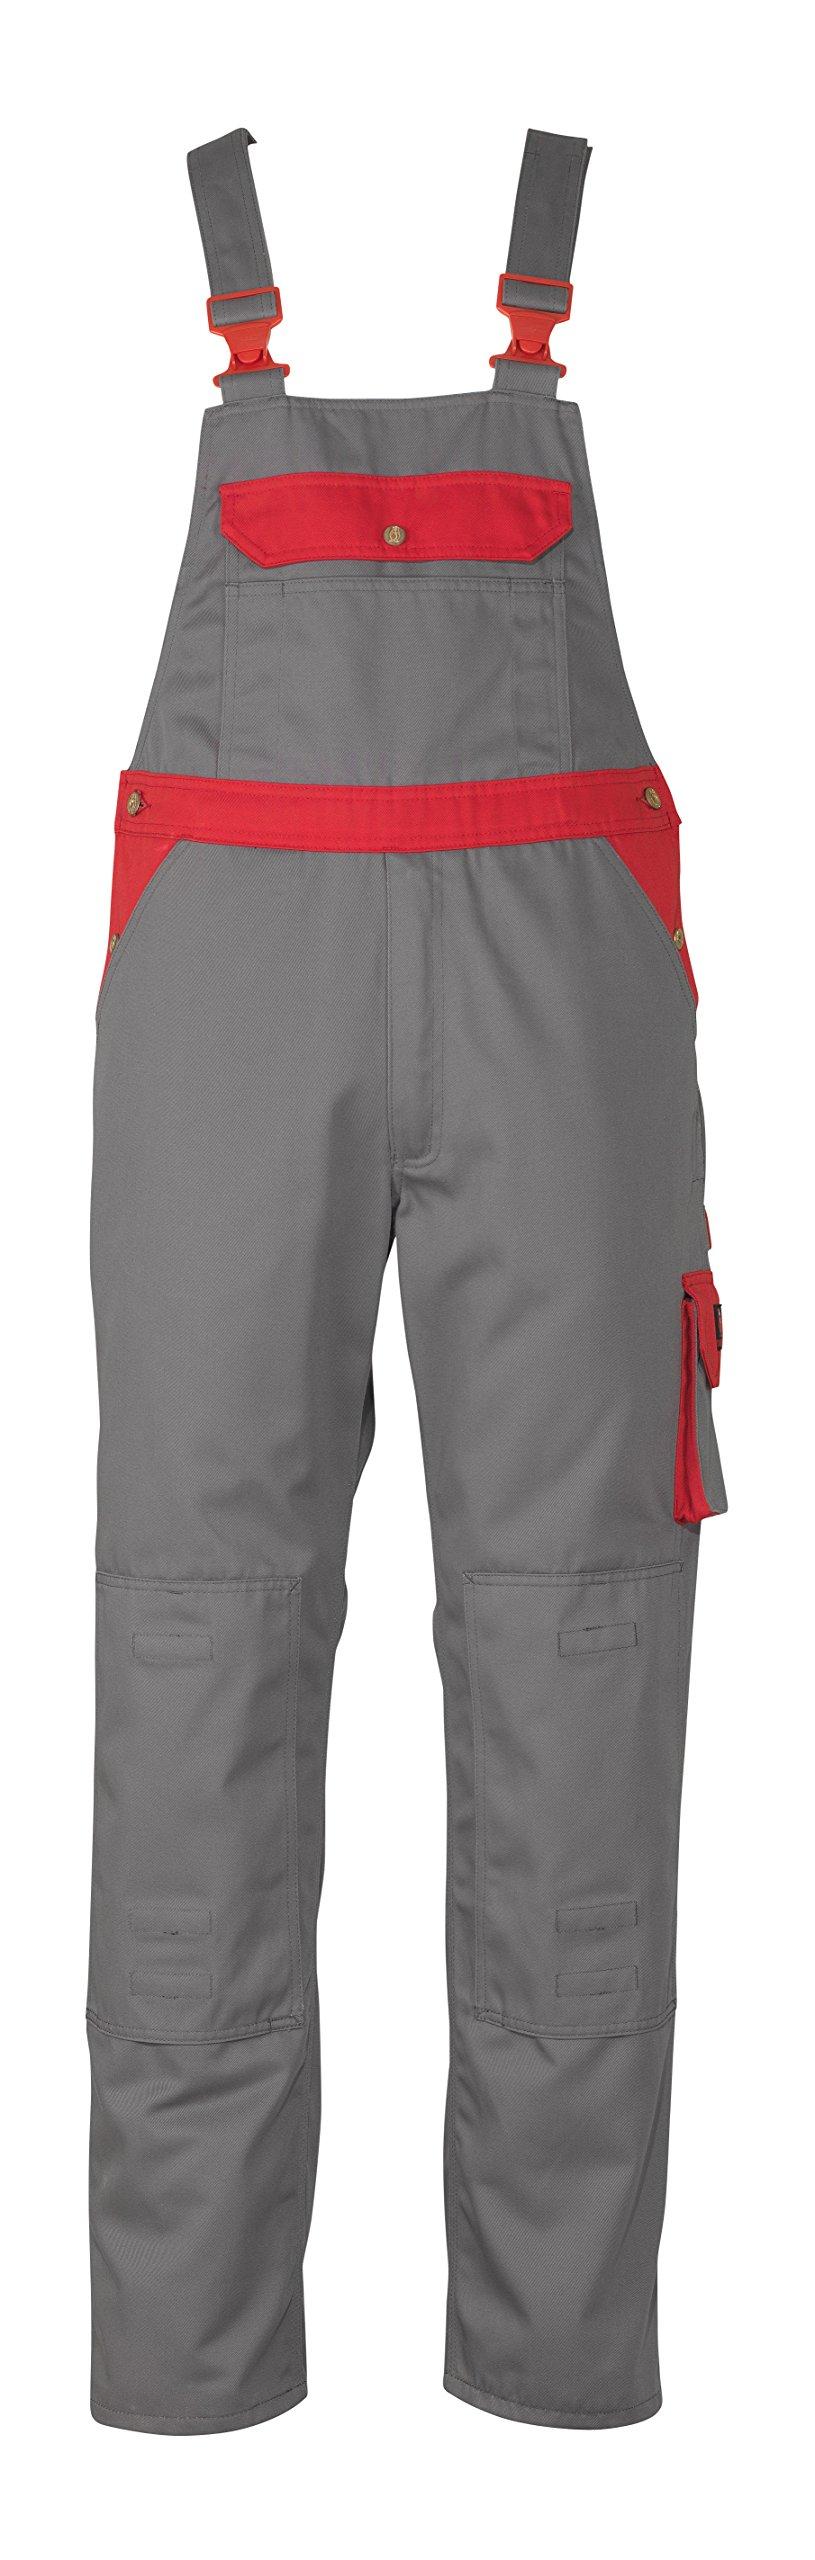 Mascot 00969430-88802-82C60''Milano'' Bib & Brace, L82cm/C60, Anthracite/red